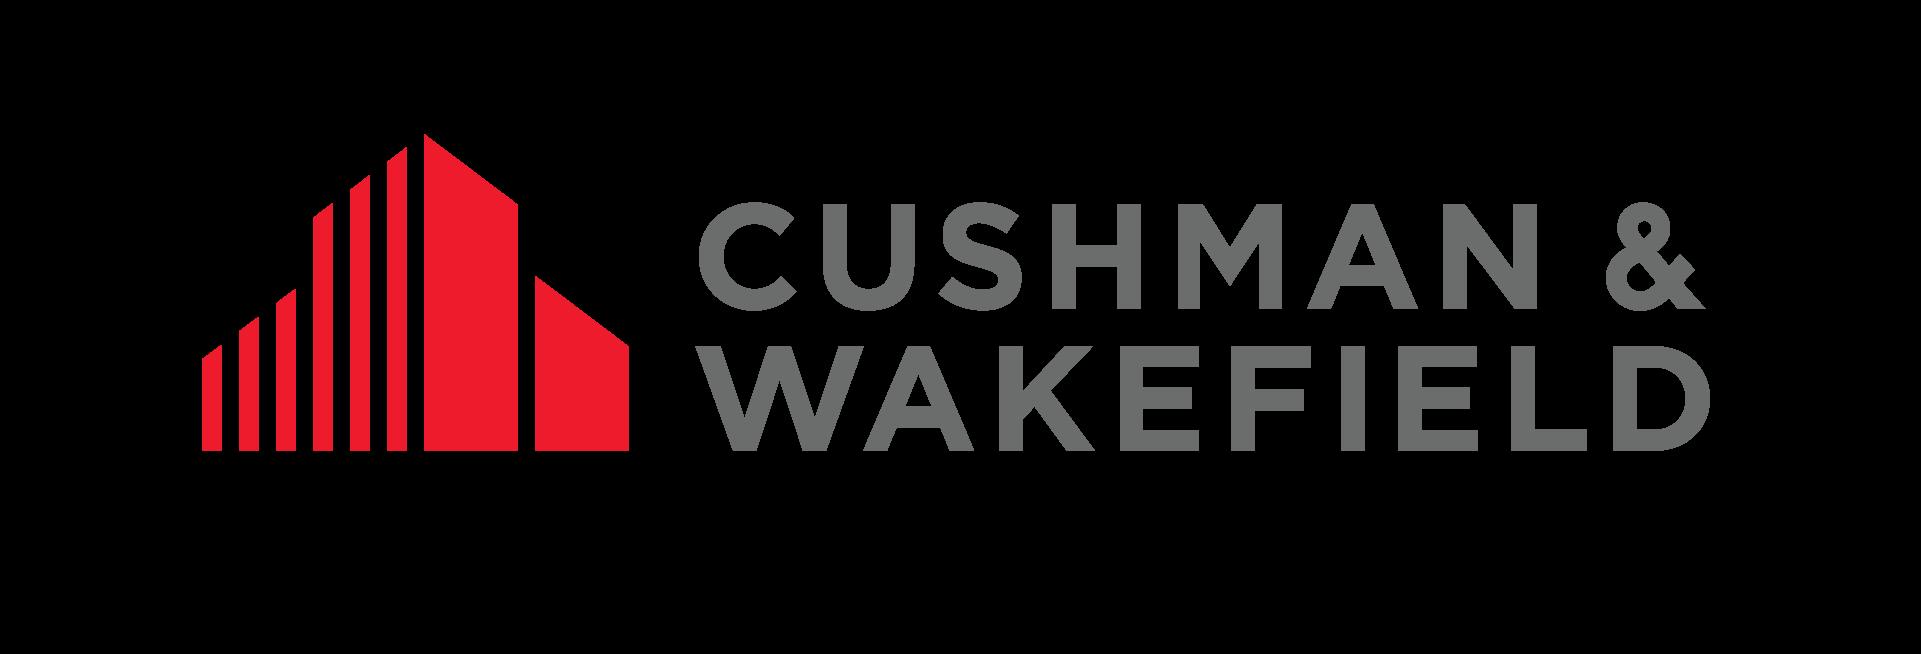 New Cushman Wakefield Logo 9-9-15